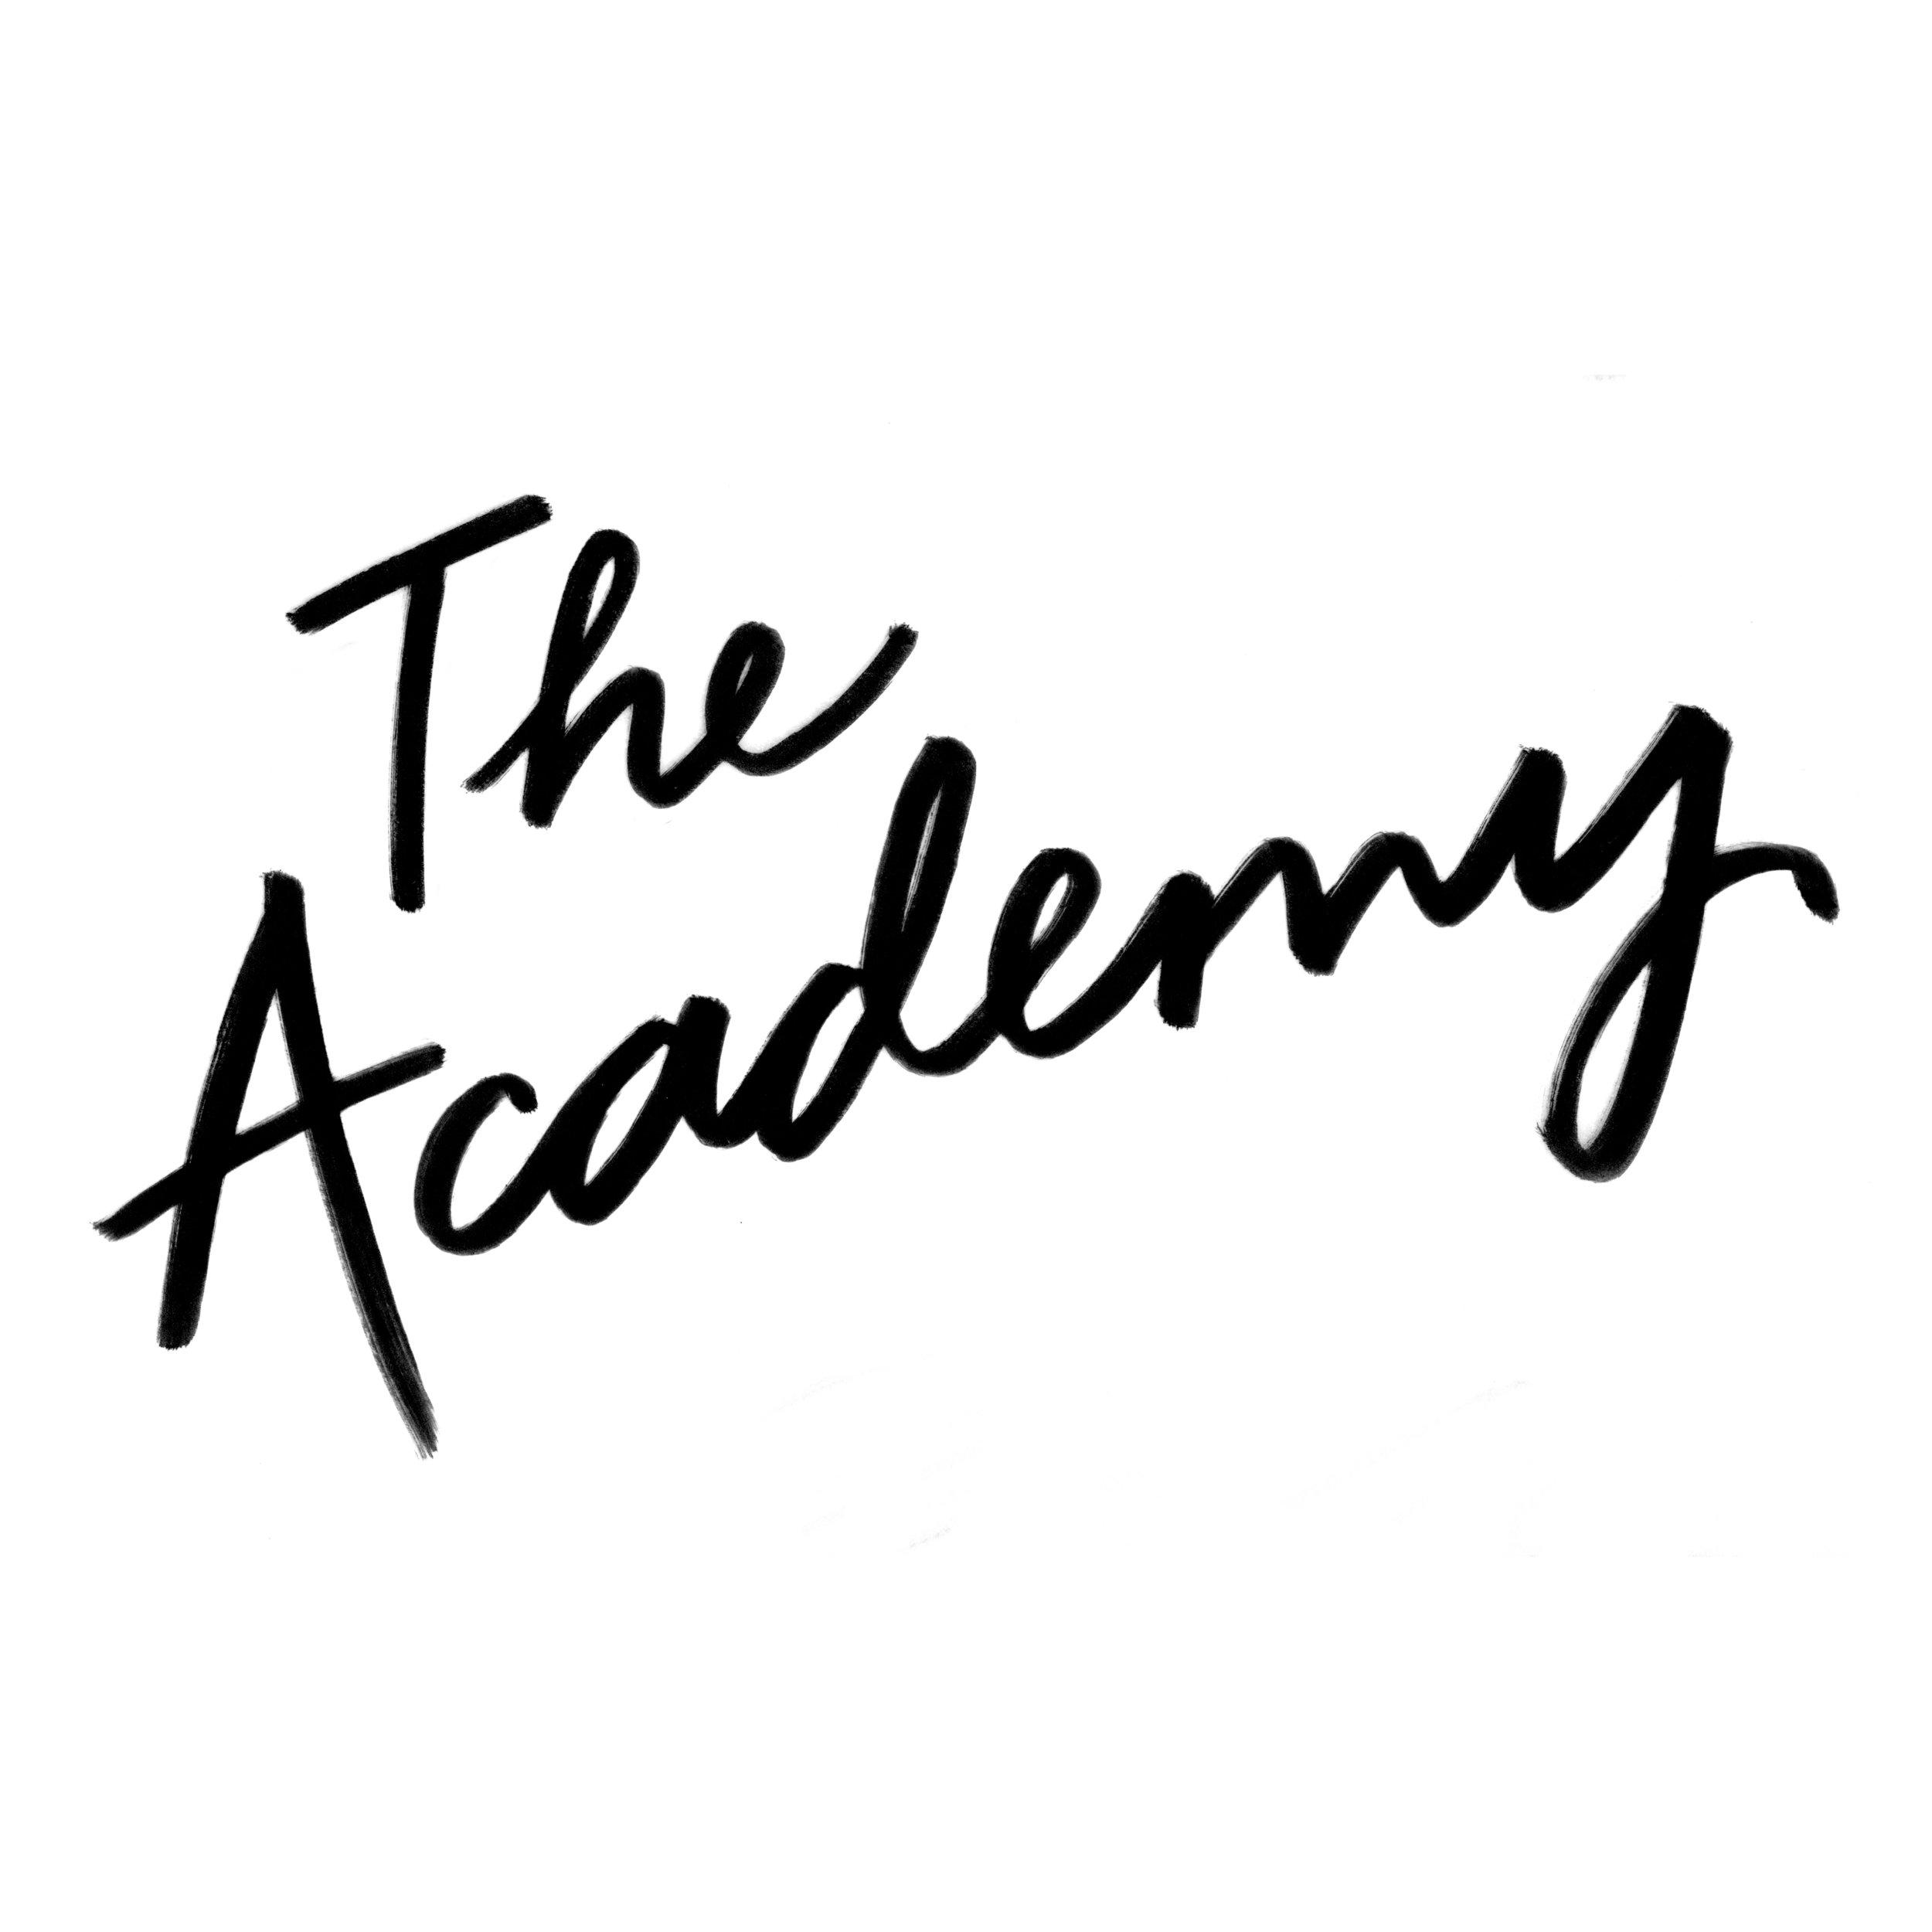 Academy_lettering.jpg